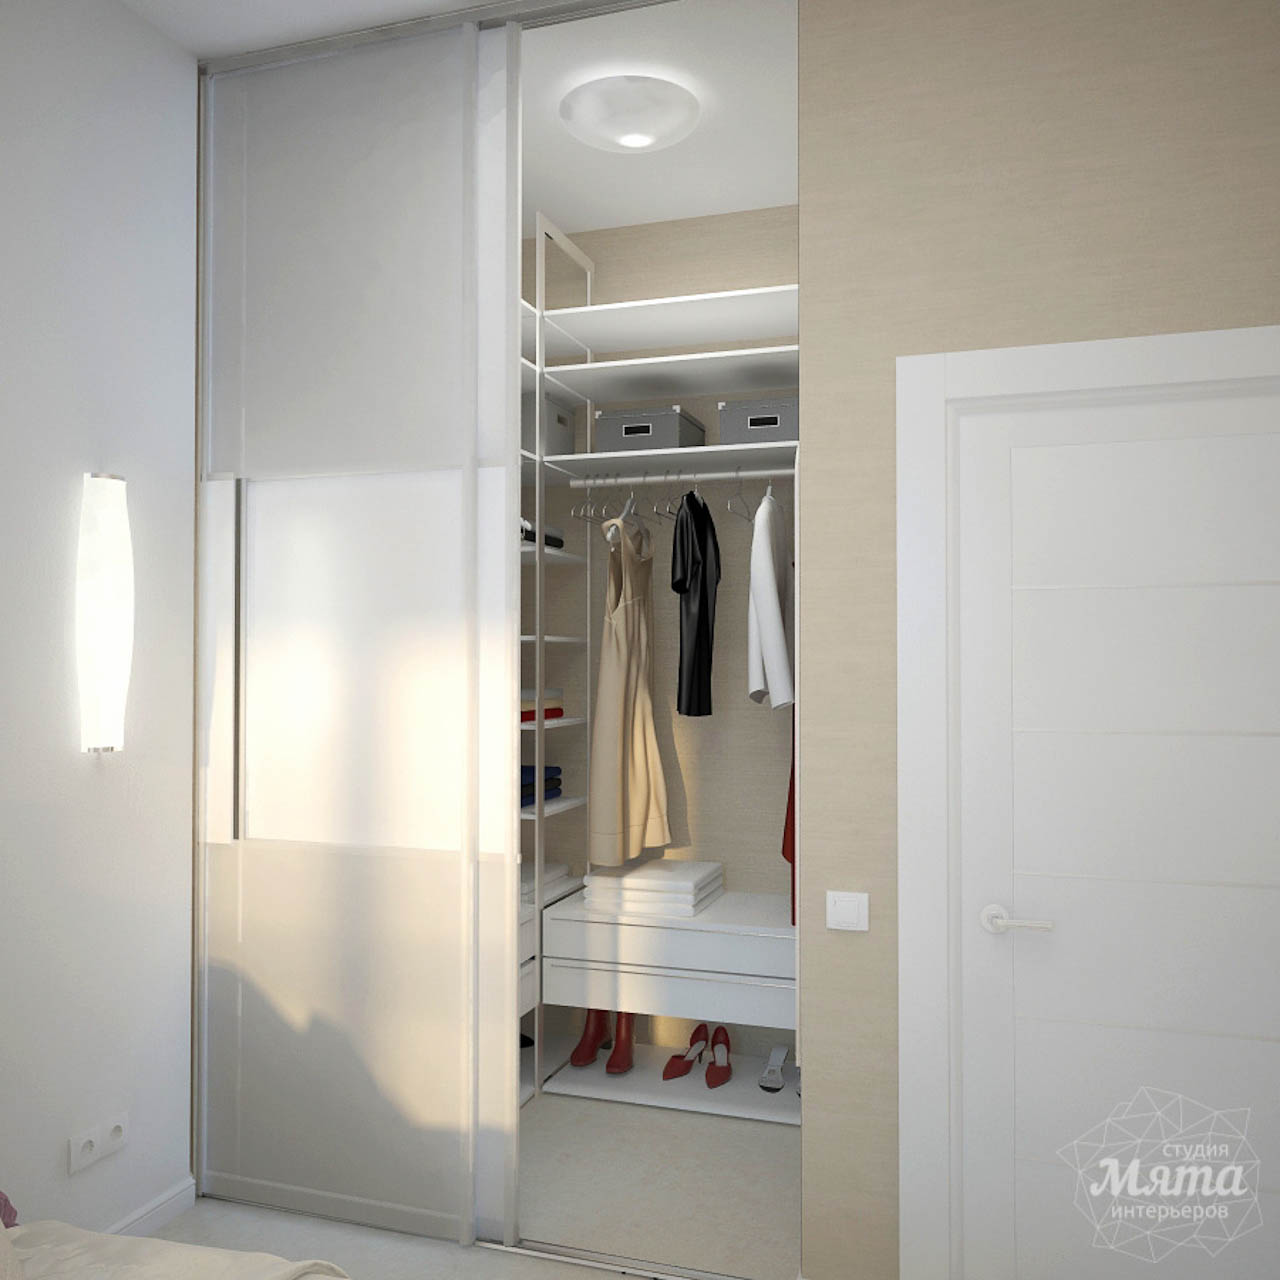 Дизайн интерьера и ремонт трехкомнатной квартиры по ул. Чкалова 124 img664051044